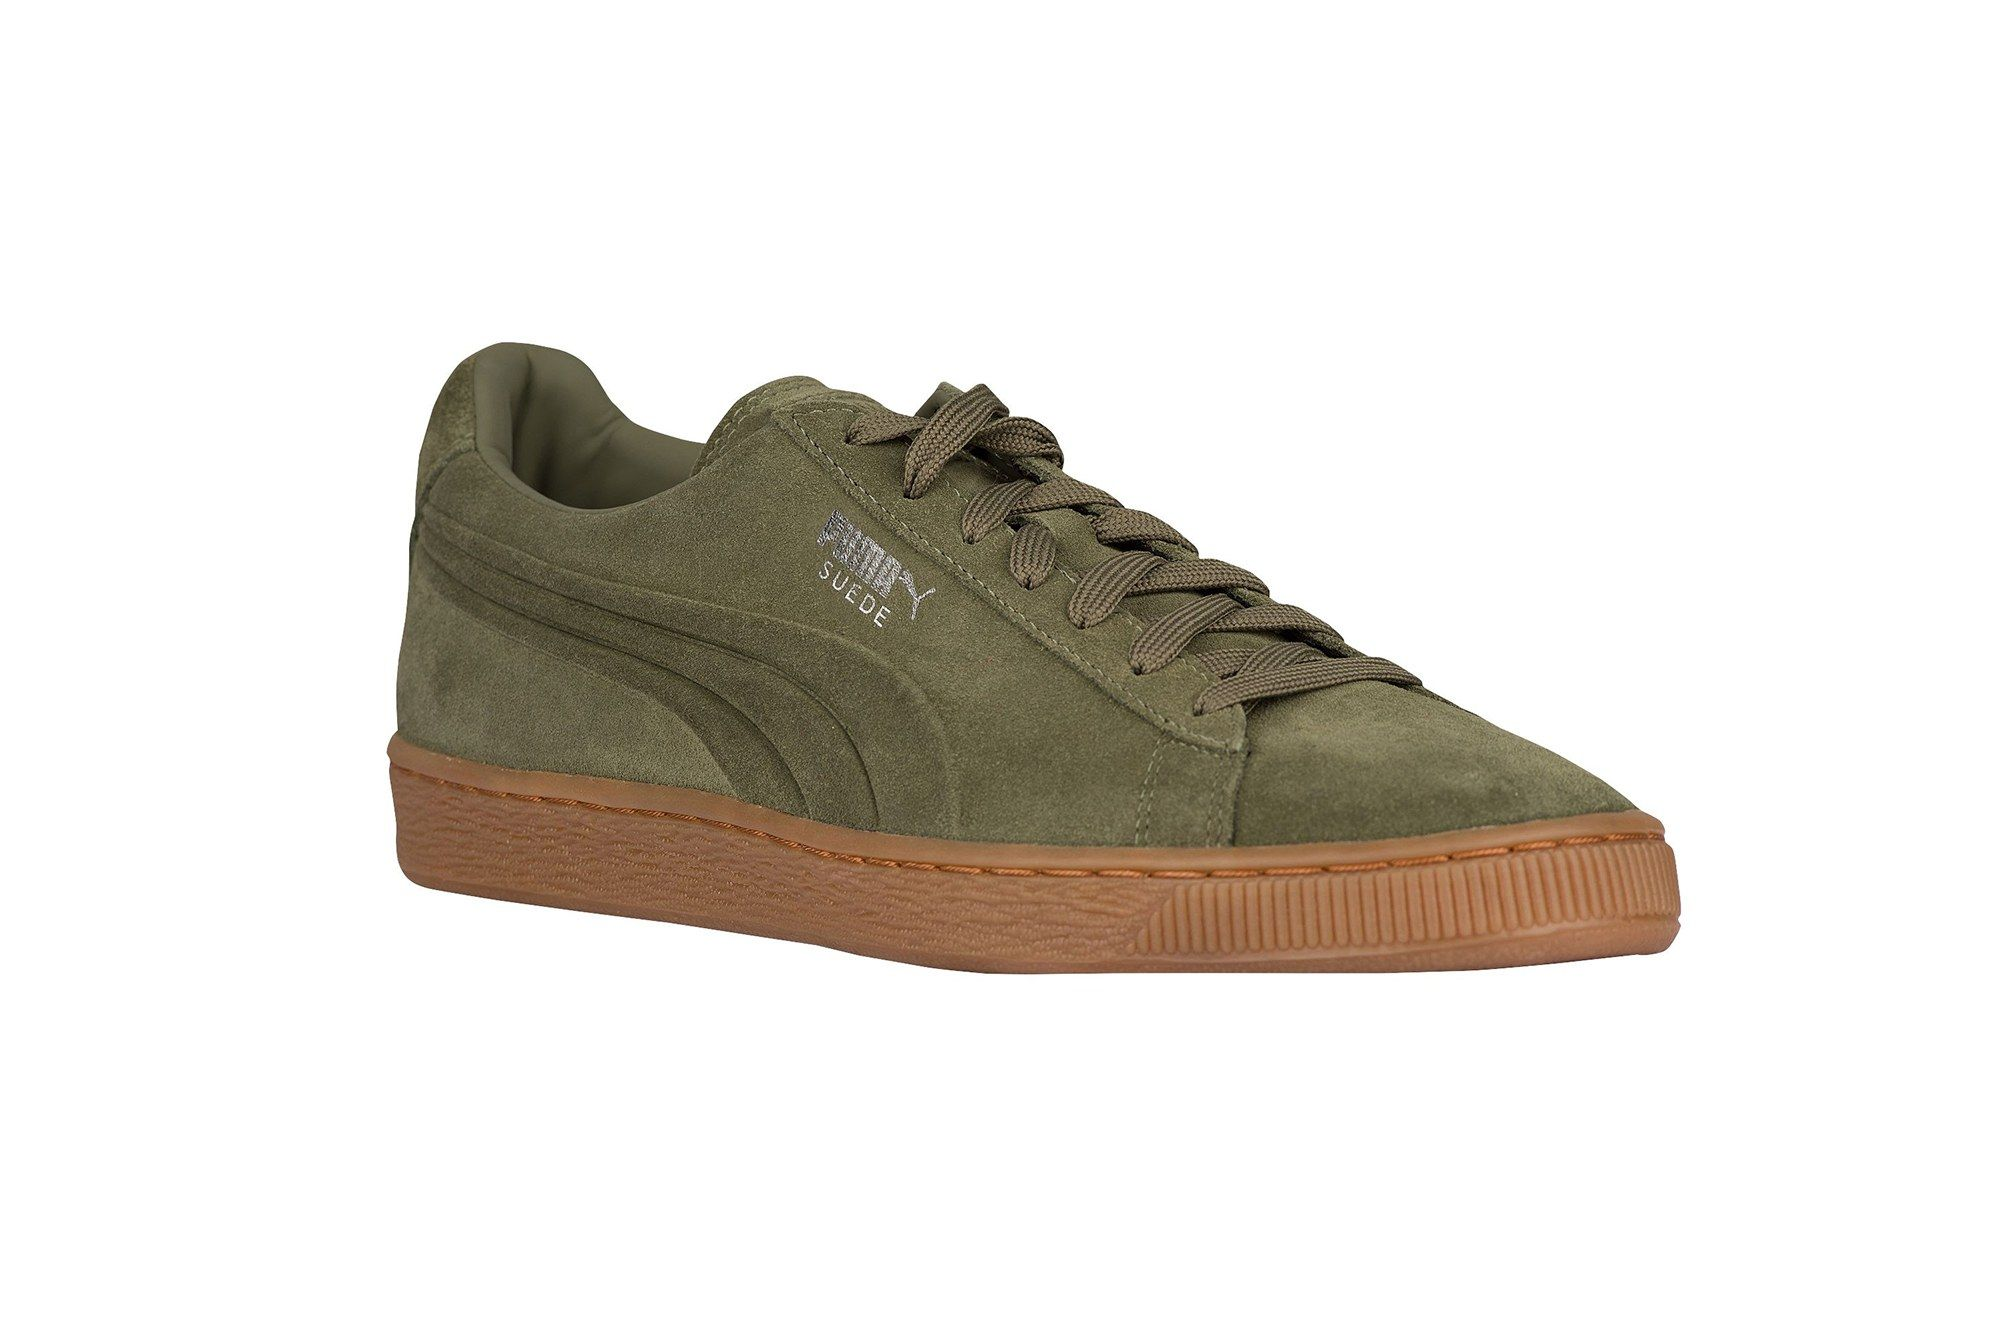 Suede shoes men, Olive sneakers, Puma suede